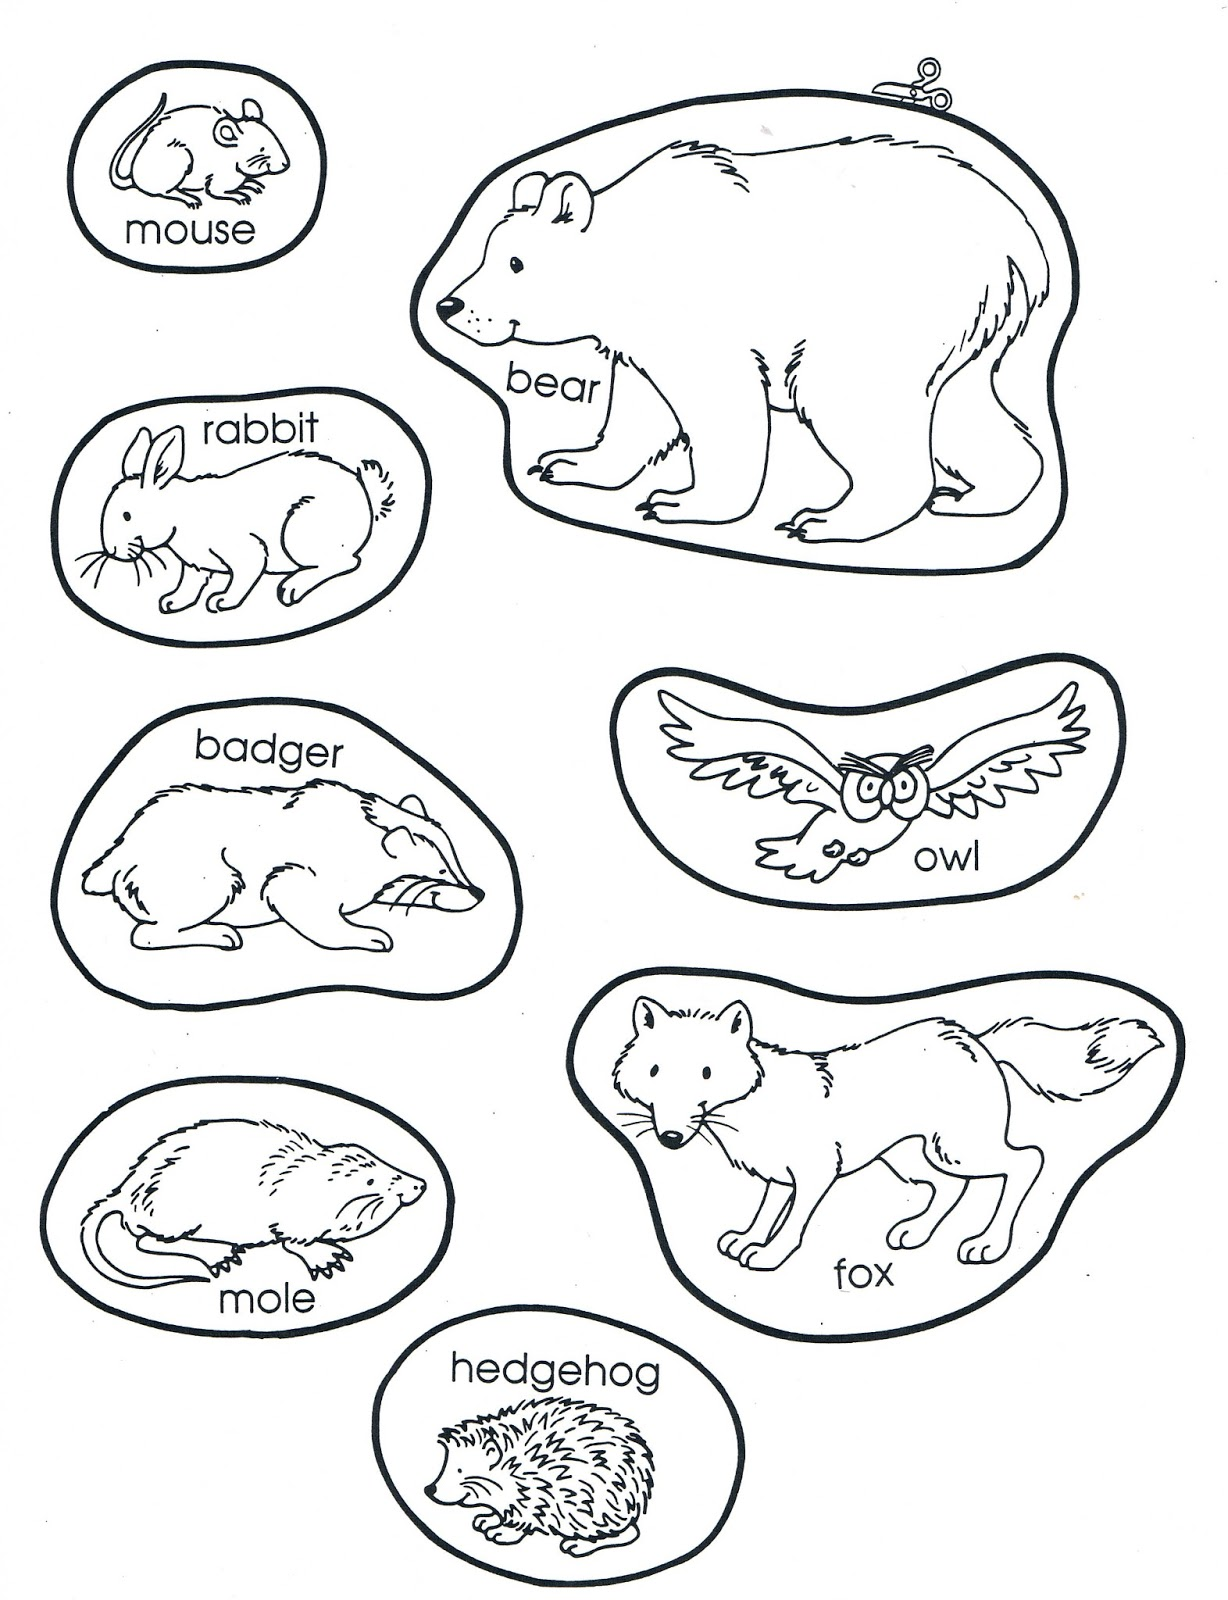 image regarding The Mitten Animals Printable named Adams Household Farm and Homeschool: Library Tale Season - The